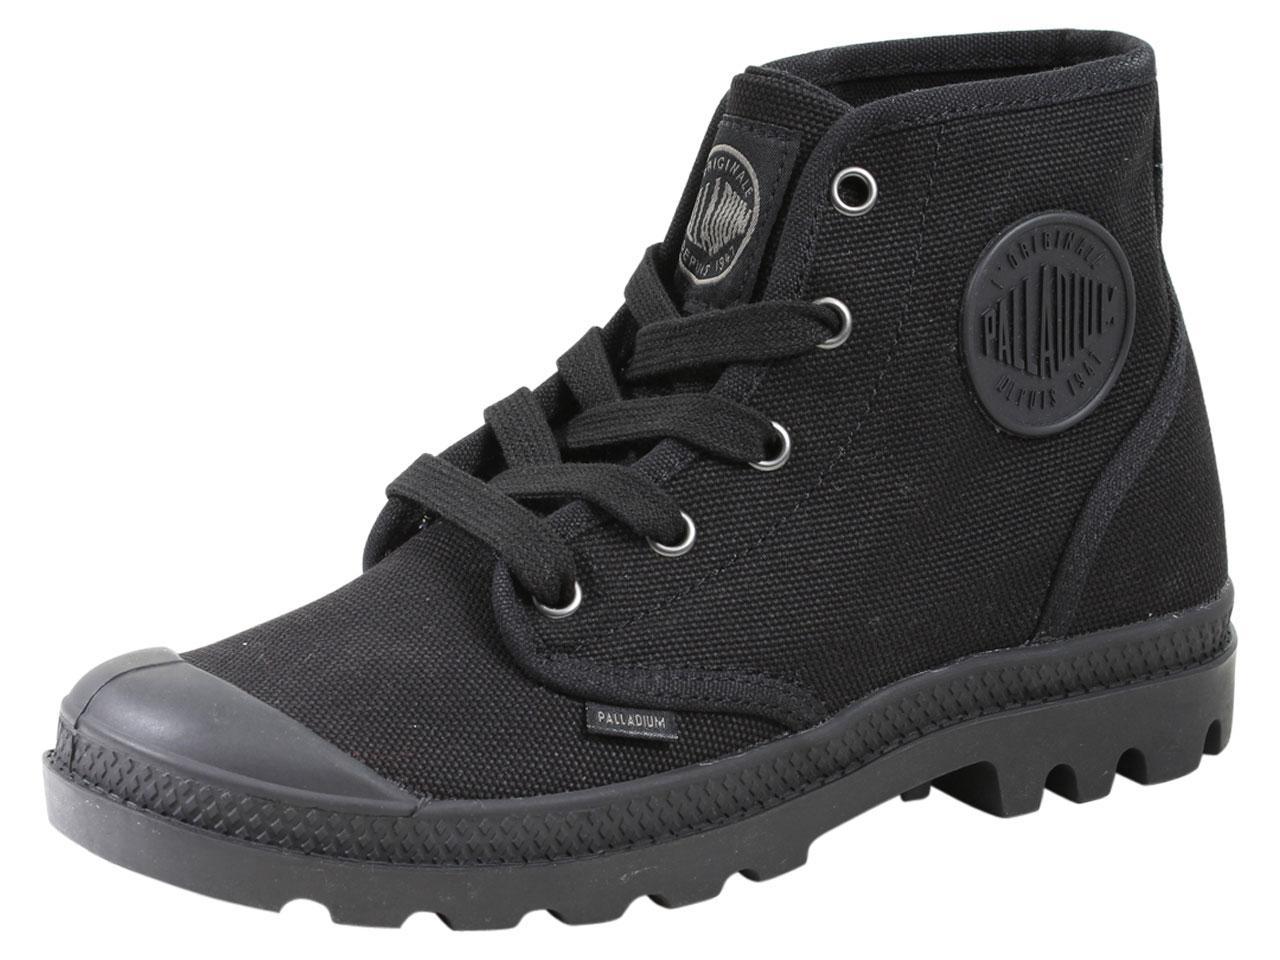 Palladium Women s Pampa-Hi Canvas Boots Shoes by Palladium e6d9cfbb93c